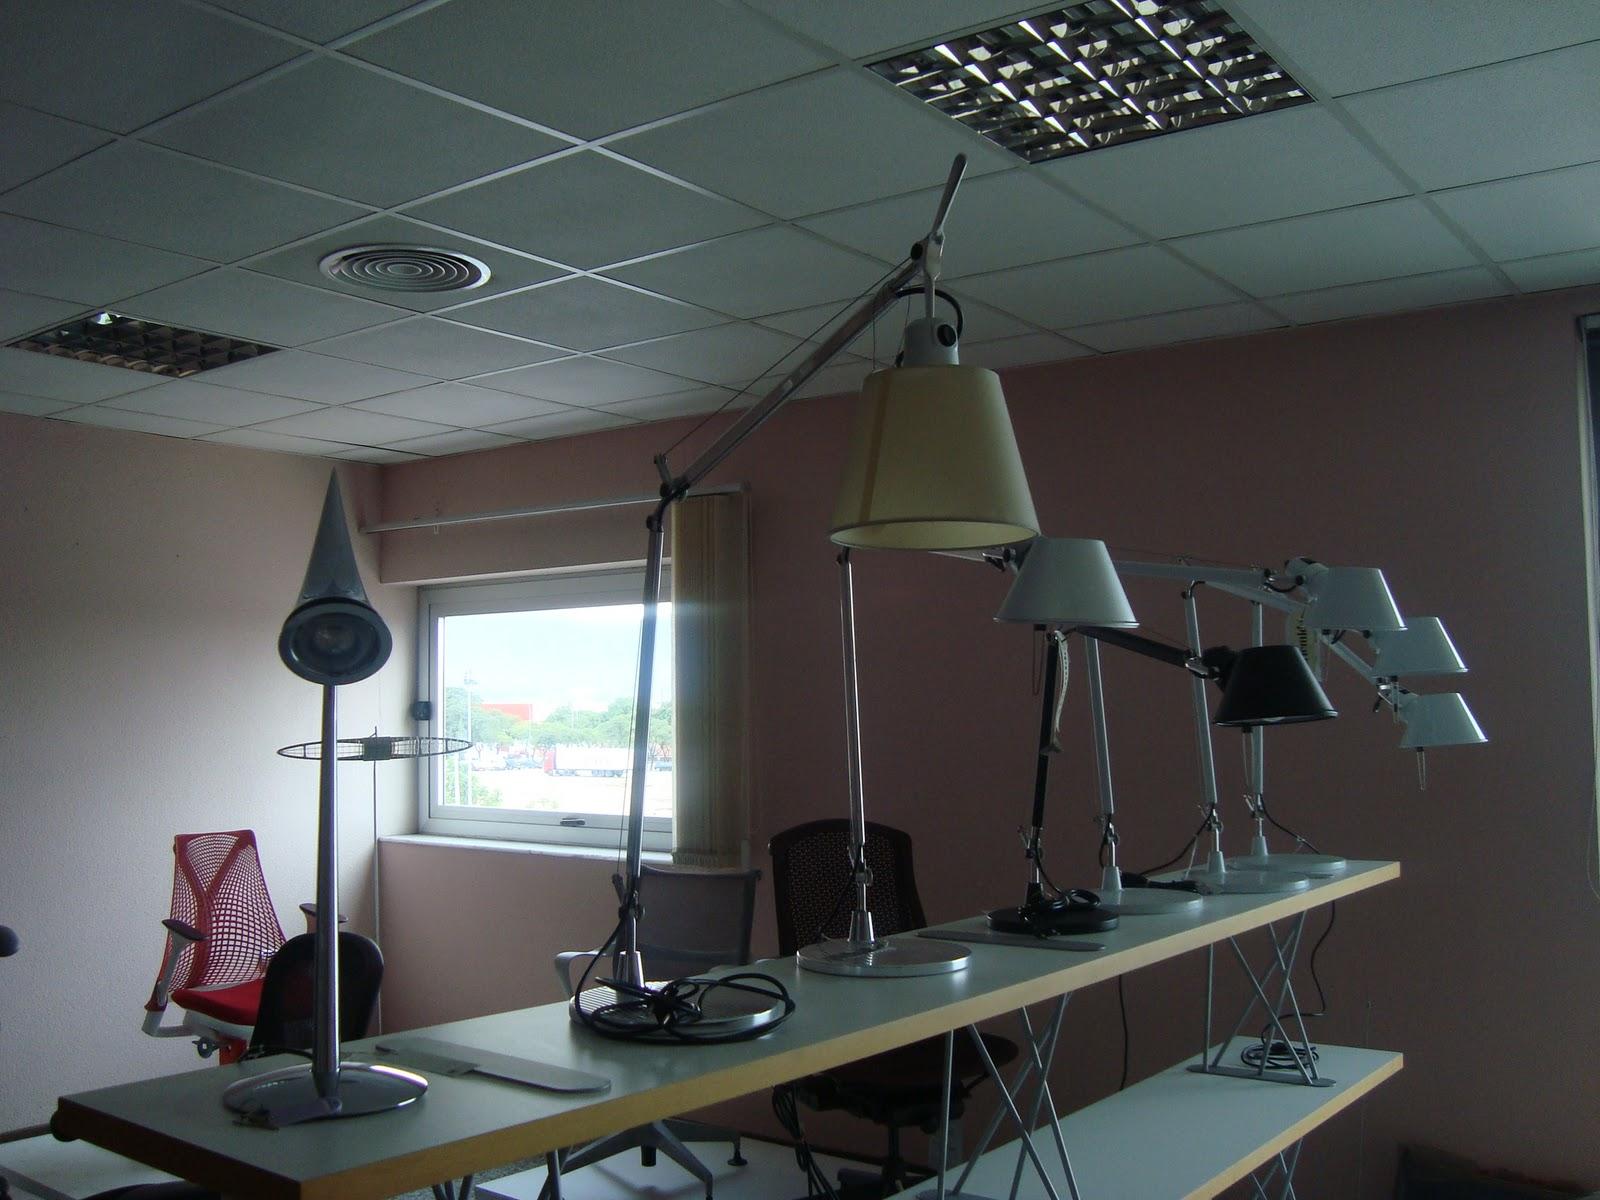 Liquidacion muebles de dise o lamparas sobre mesa for Liquidacion muebles diseno